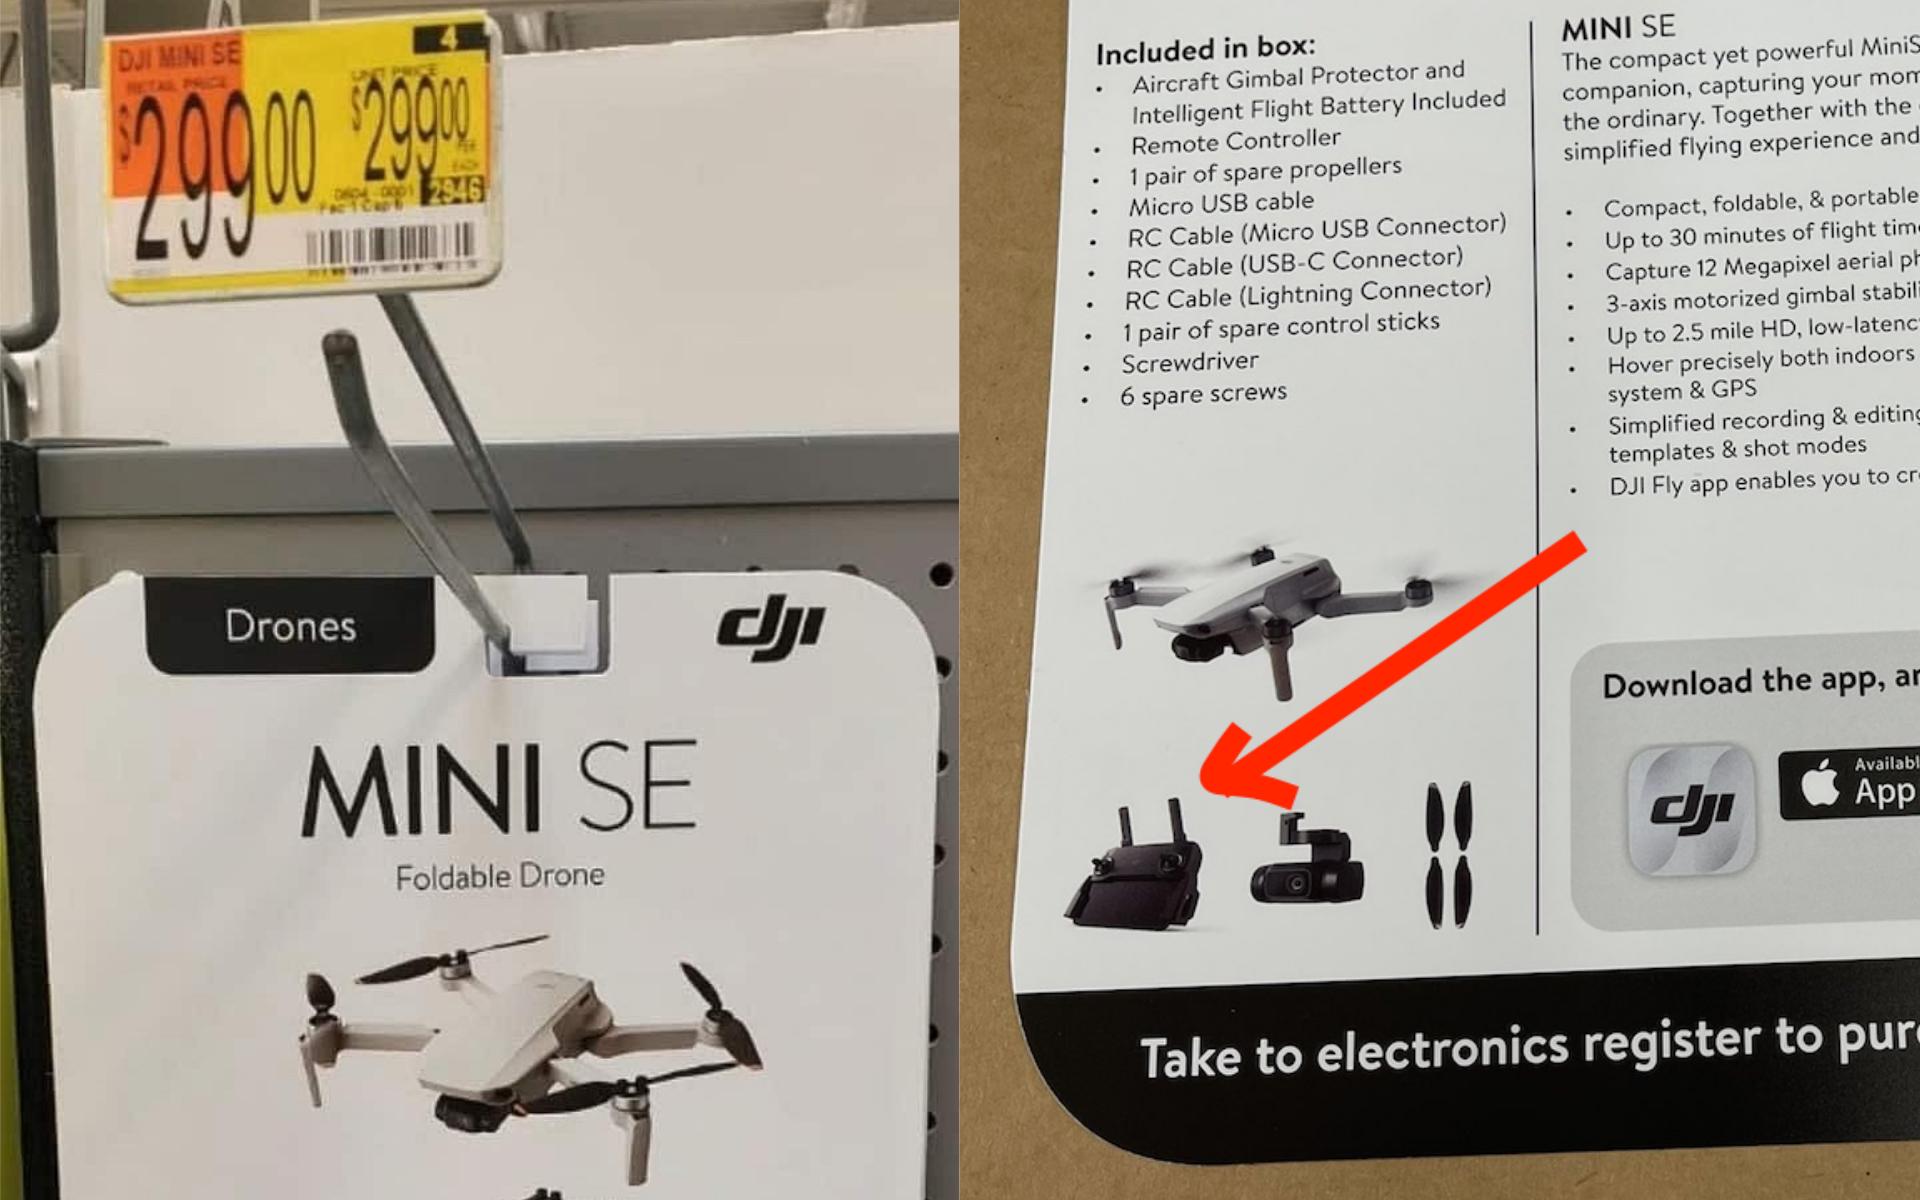 DJI Mini SE 疑似定價 299 美金 到底標配什麼遙控器?